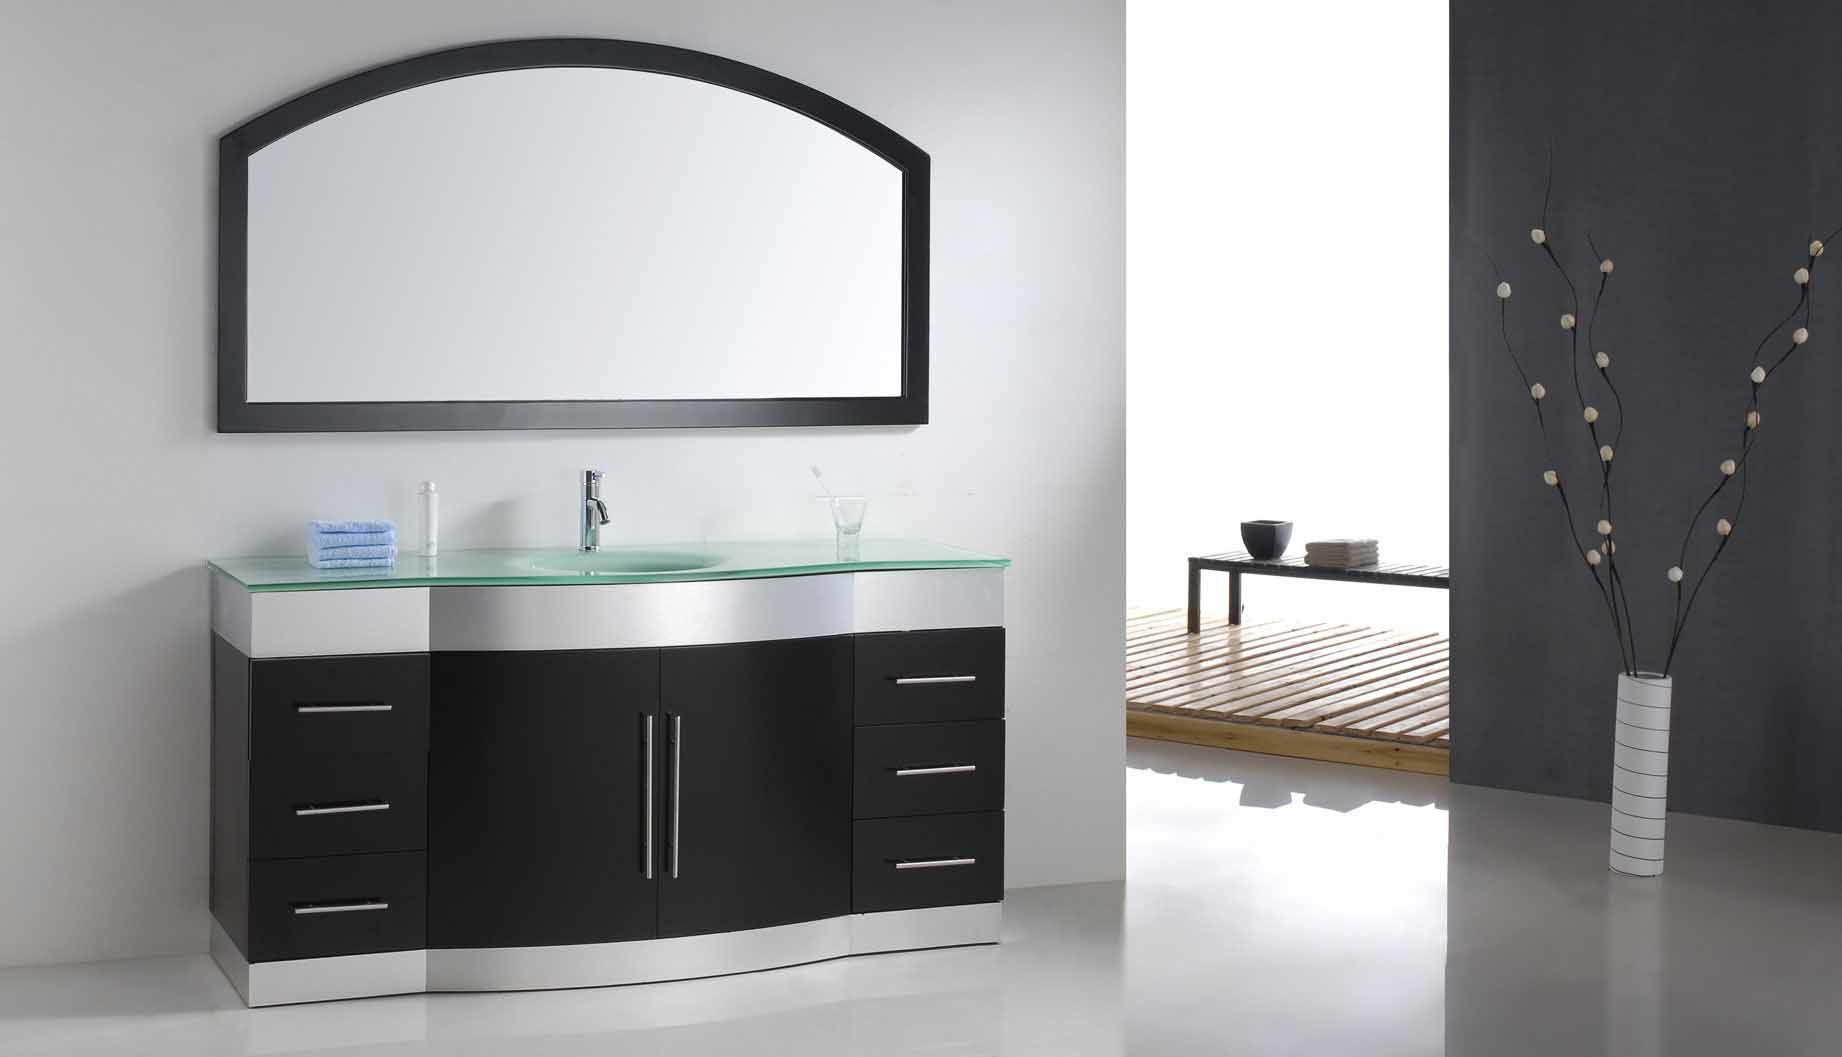 latest 48 white bathroom vanity gallery-Sensational 48 White Bathroom Vanity Gallery